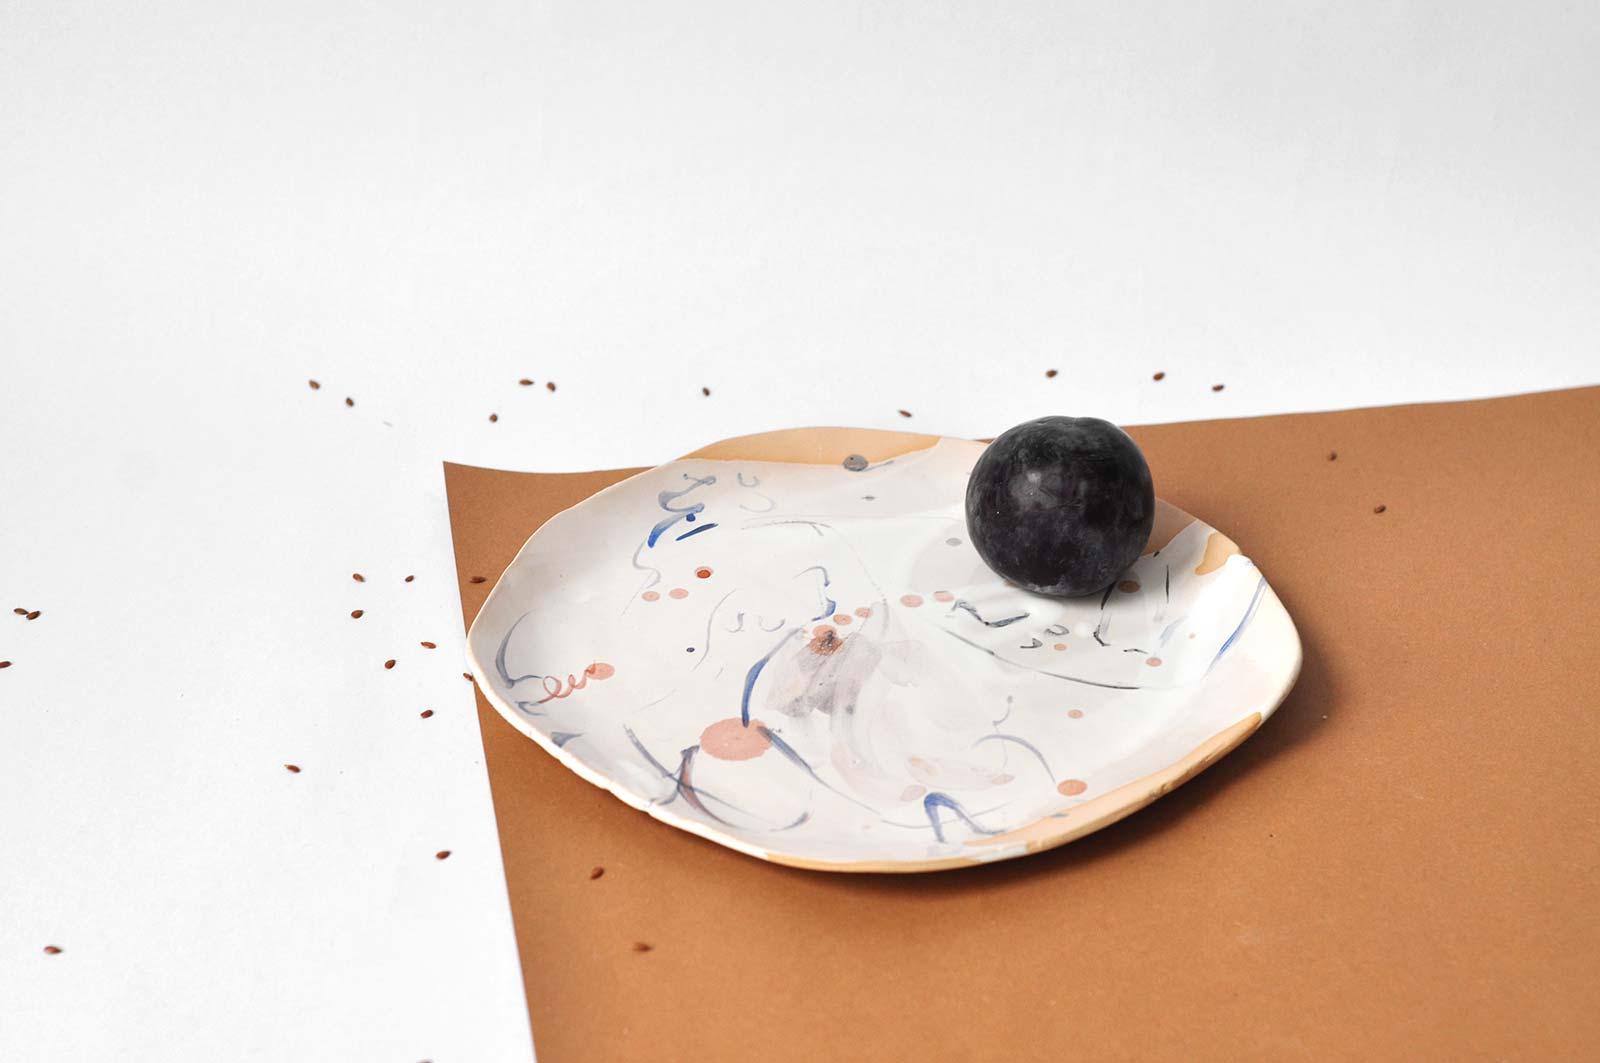 Вид сбоку - Декоративная тарелка (Ручная работа)